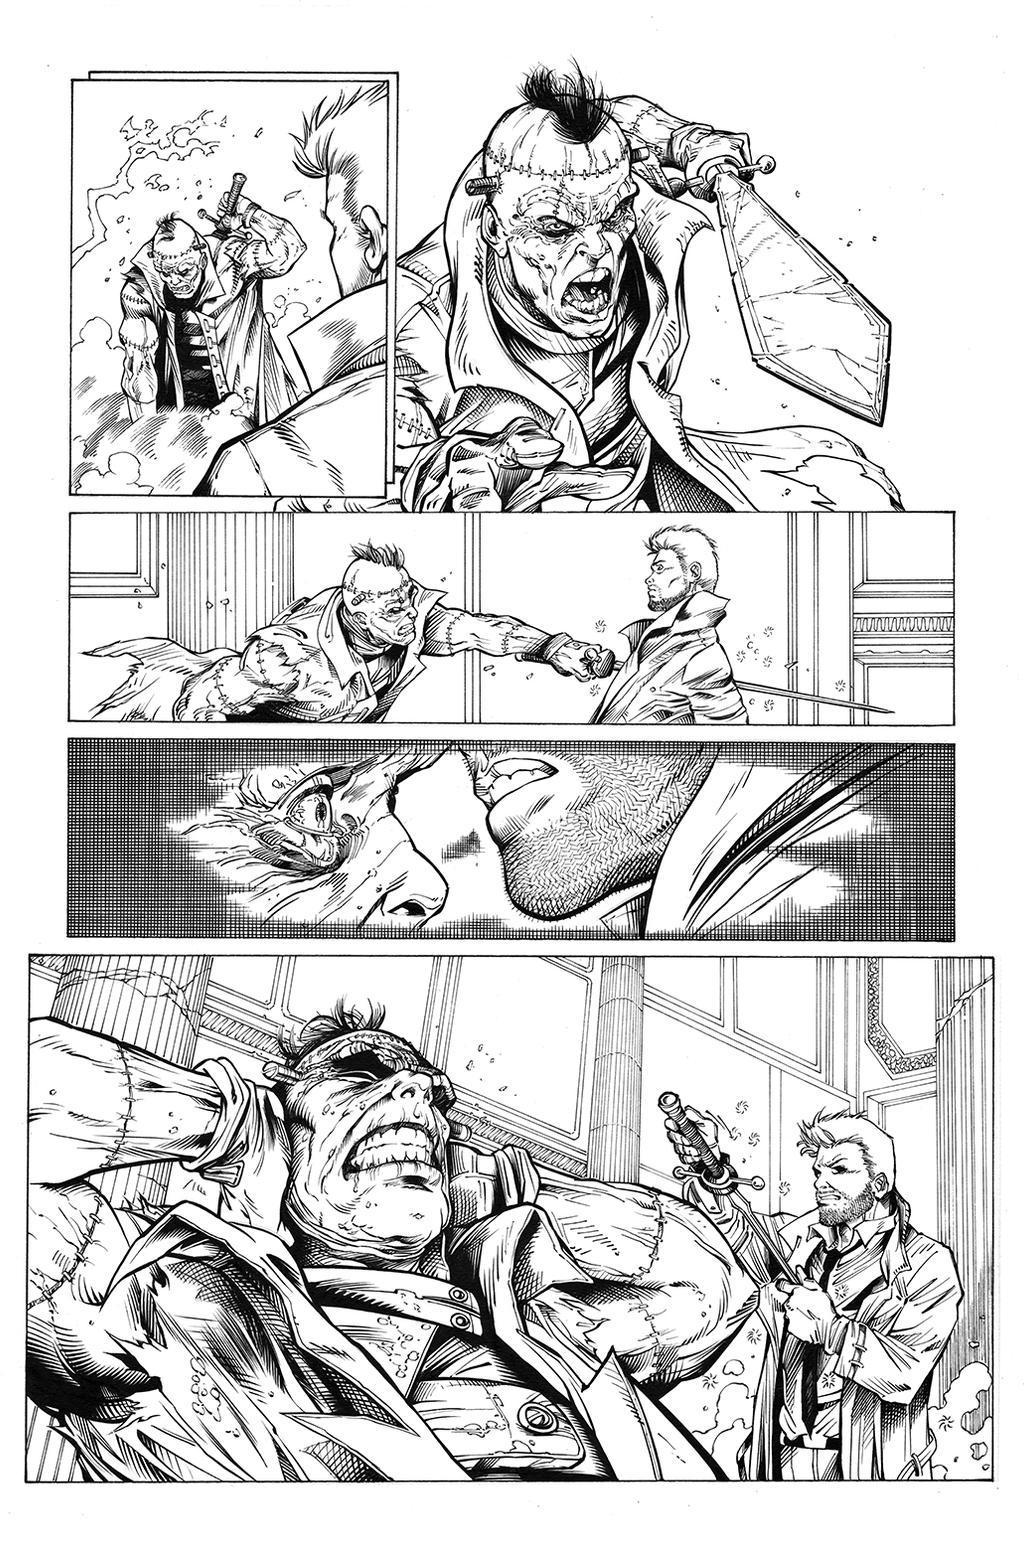 Justice Laegue Dark 30 by MarkIrwin